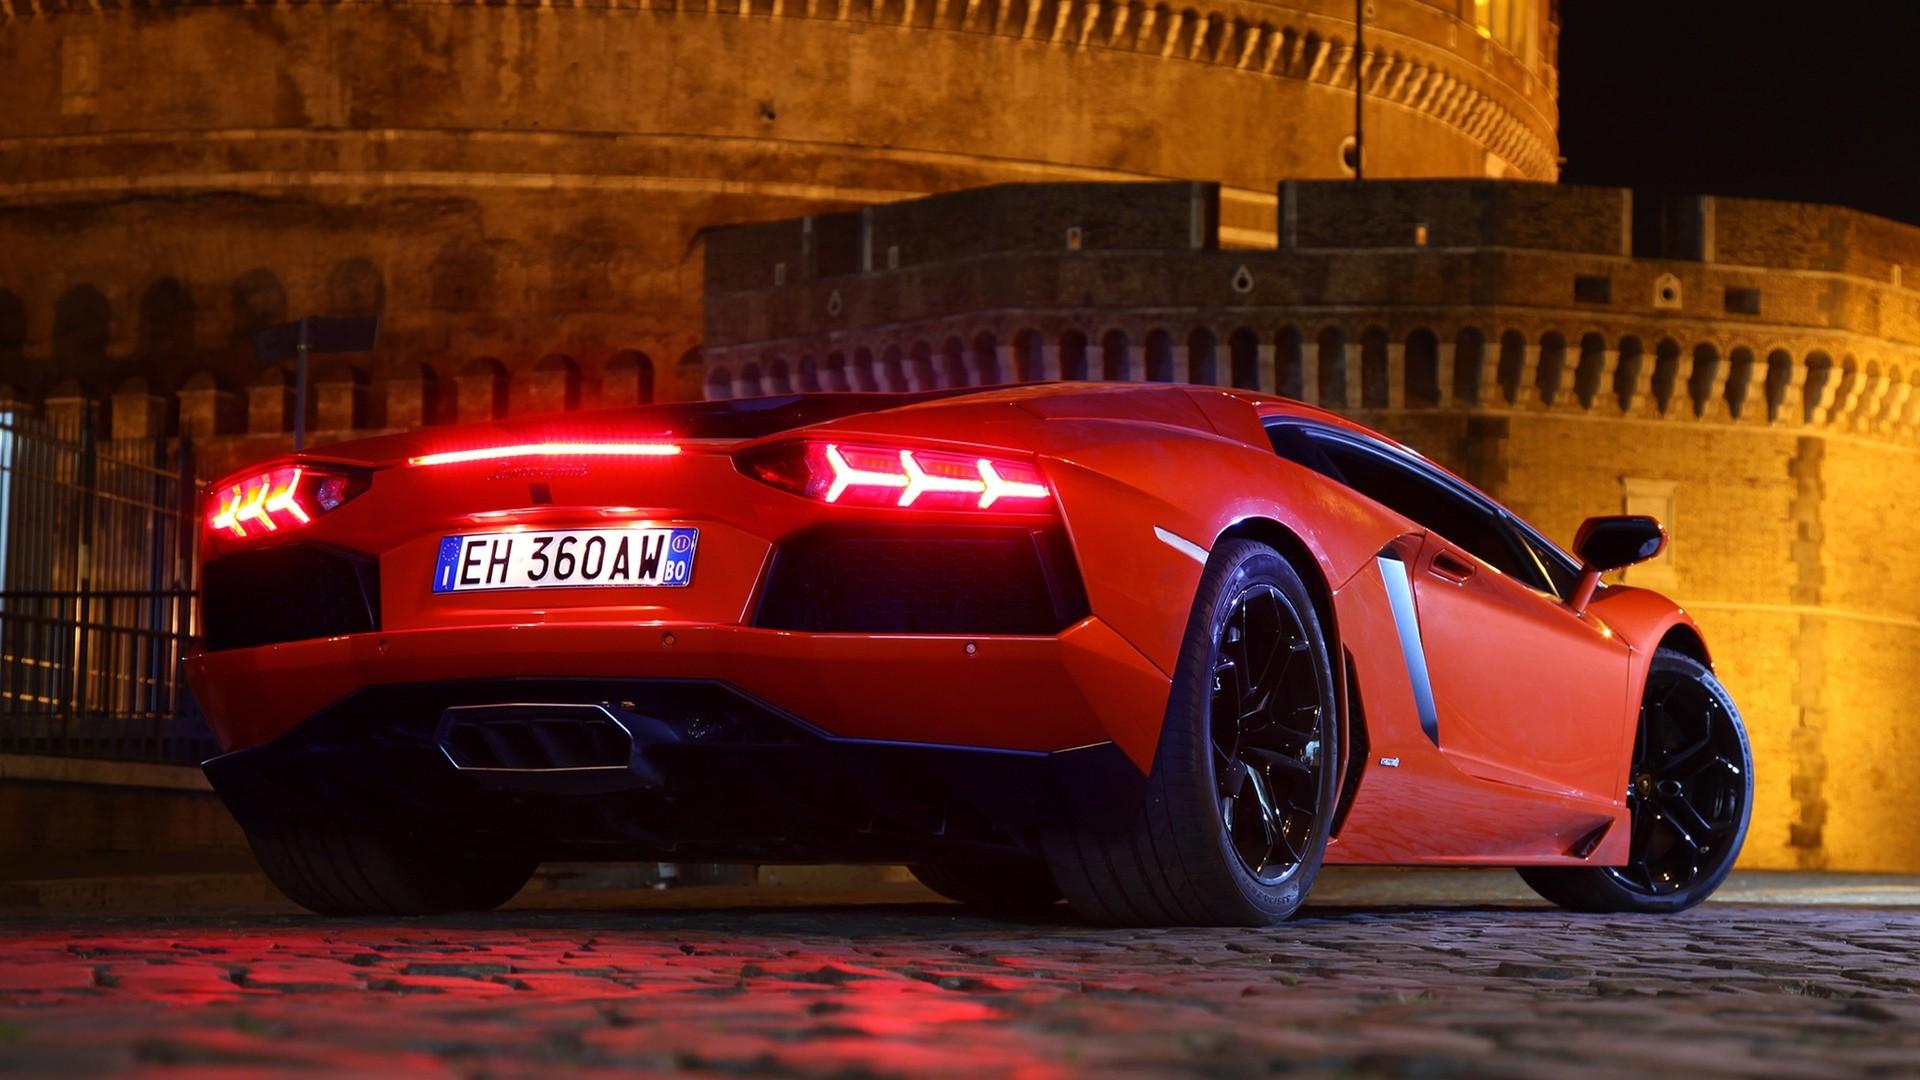 Lamborghini Hd Wallpaper Wallpapertag